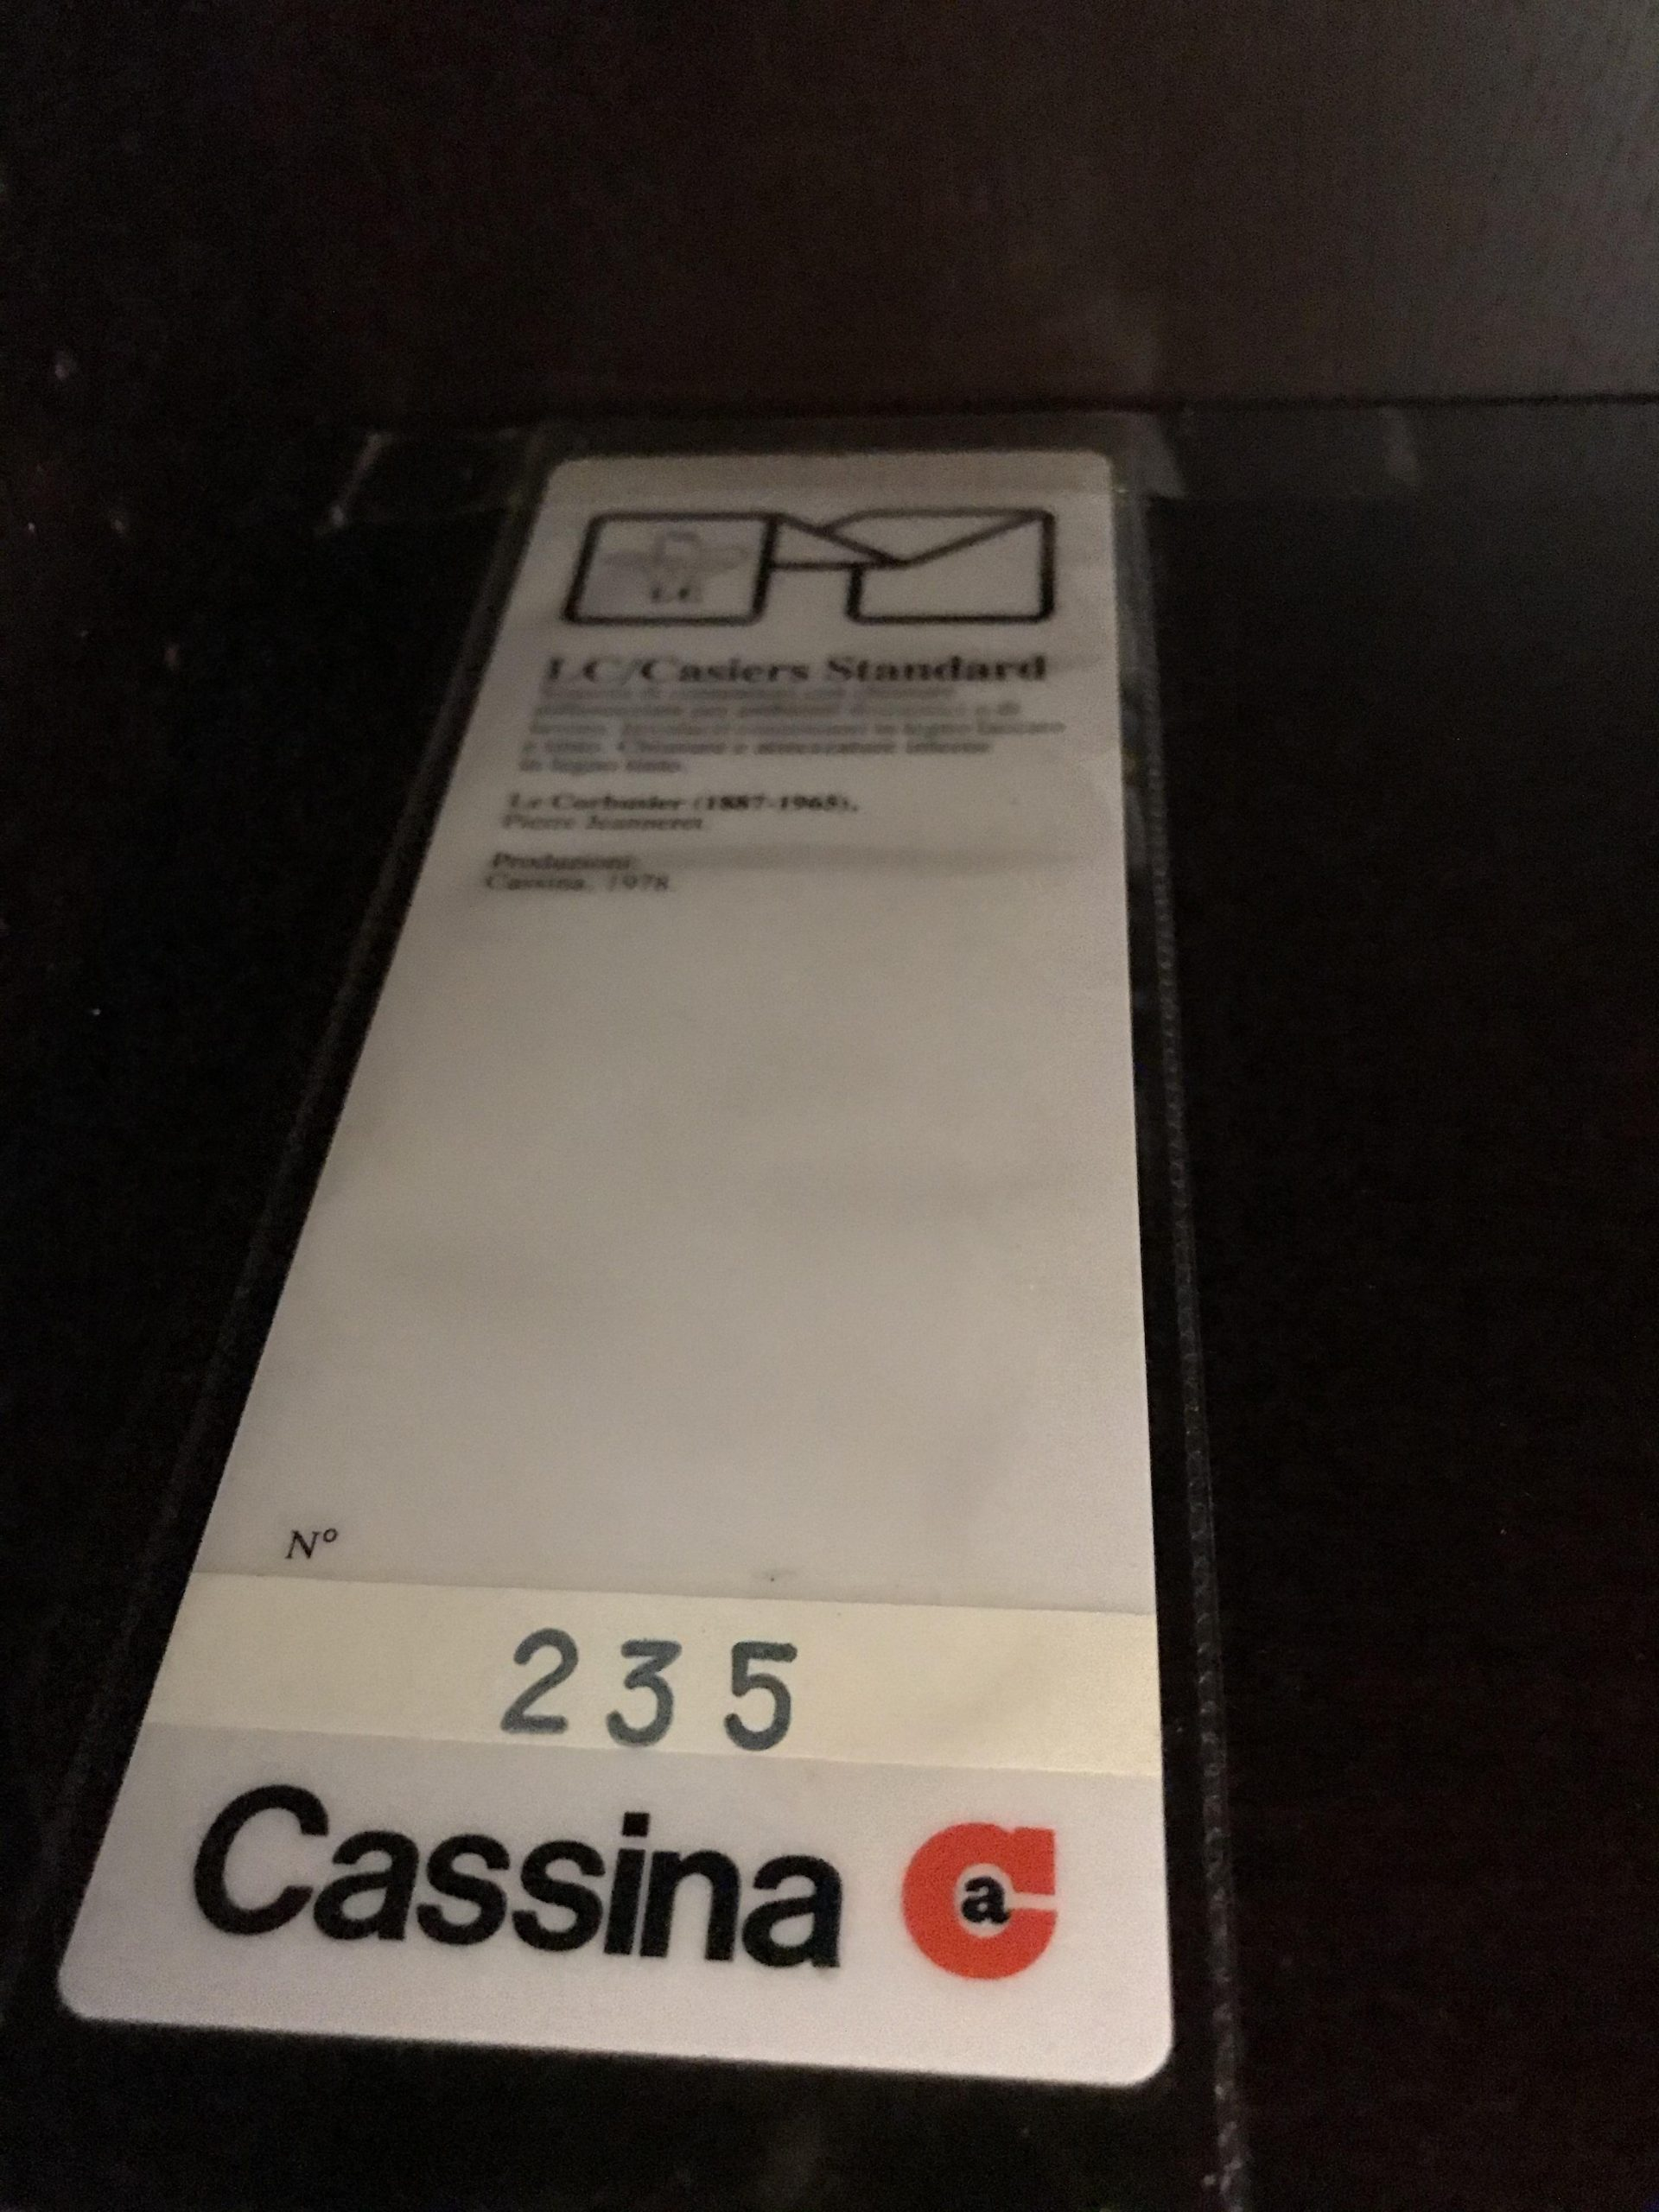 LC20 CASIERS STANDARD Le Corbusier Cassina original design Made in Italy